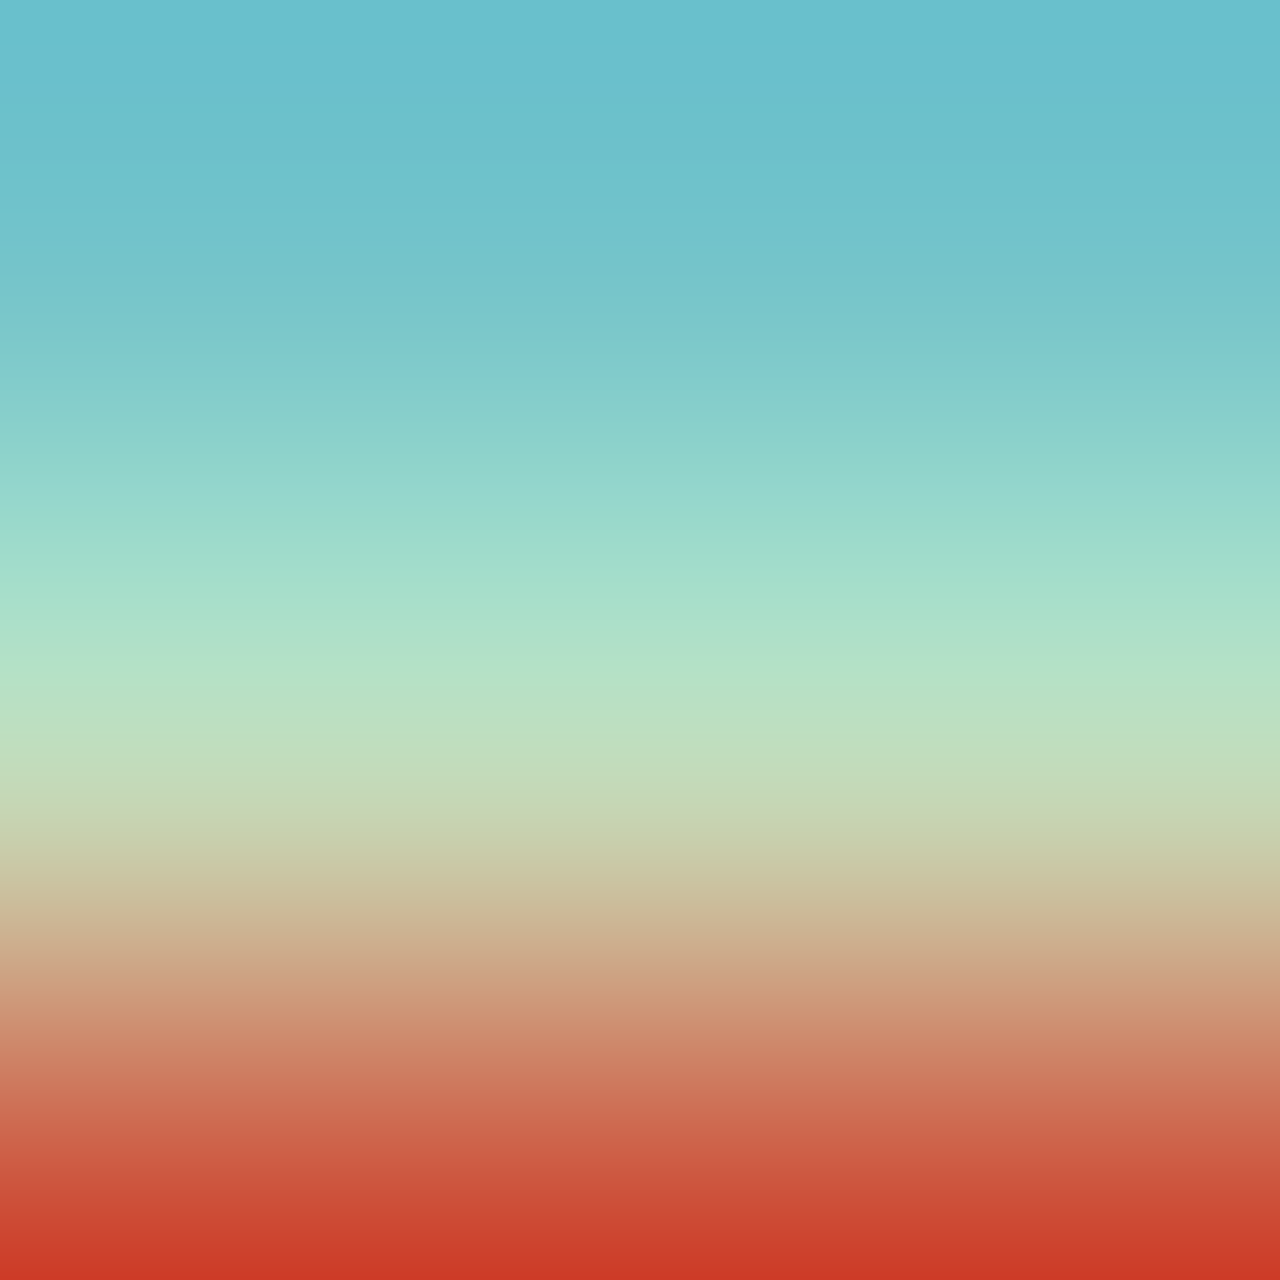 colorful gradient 23431